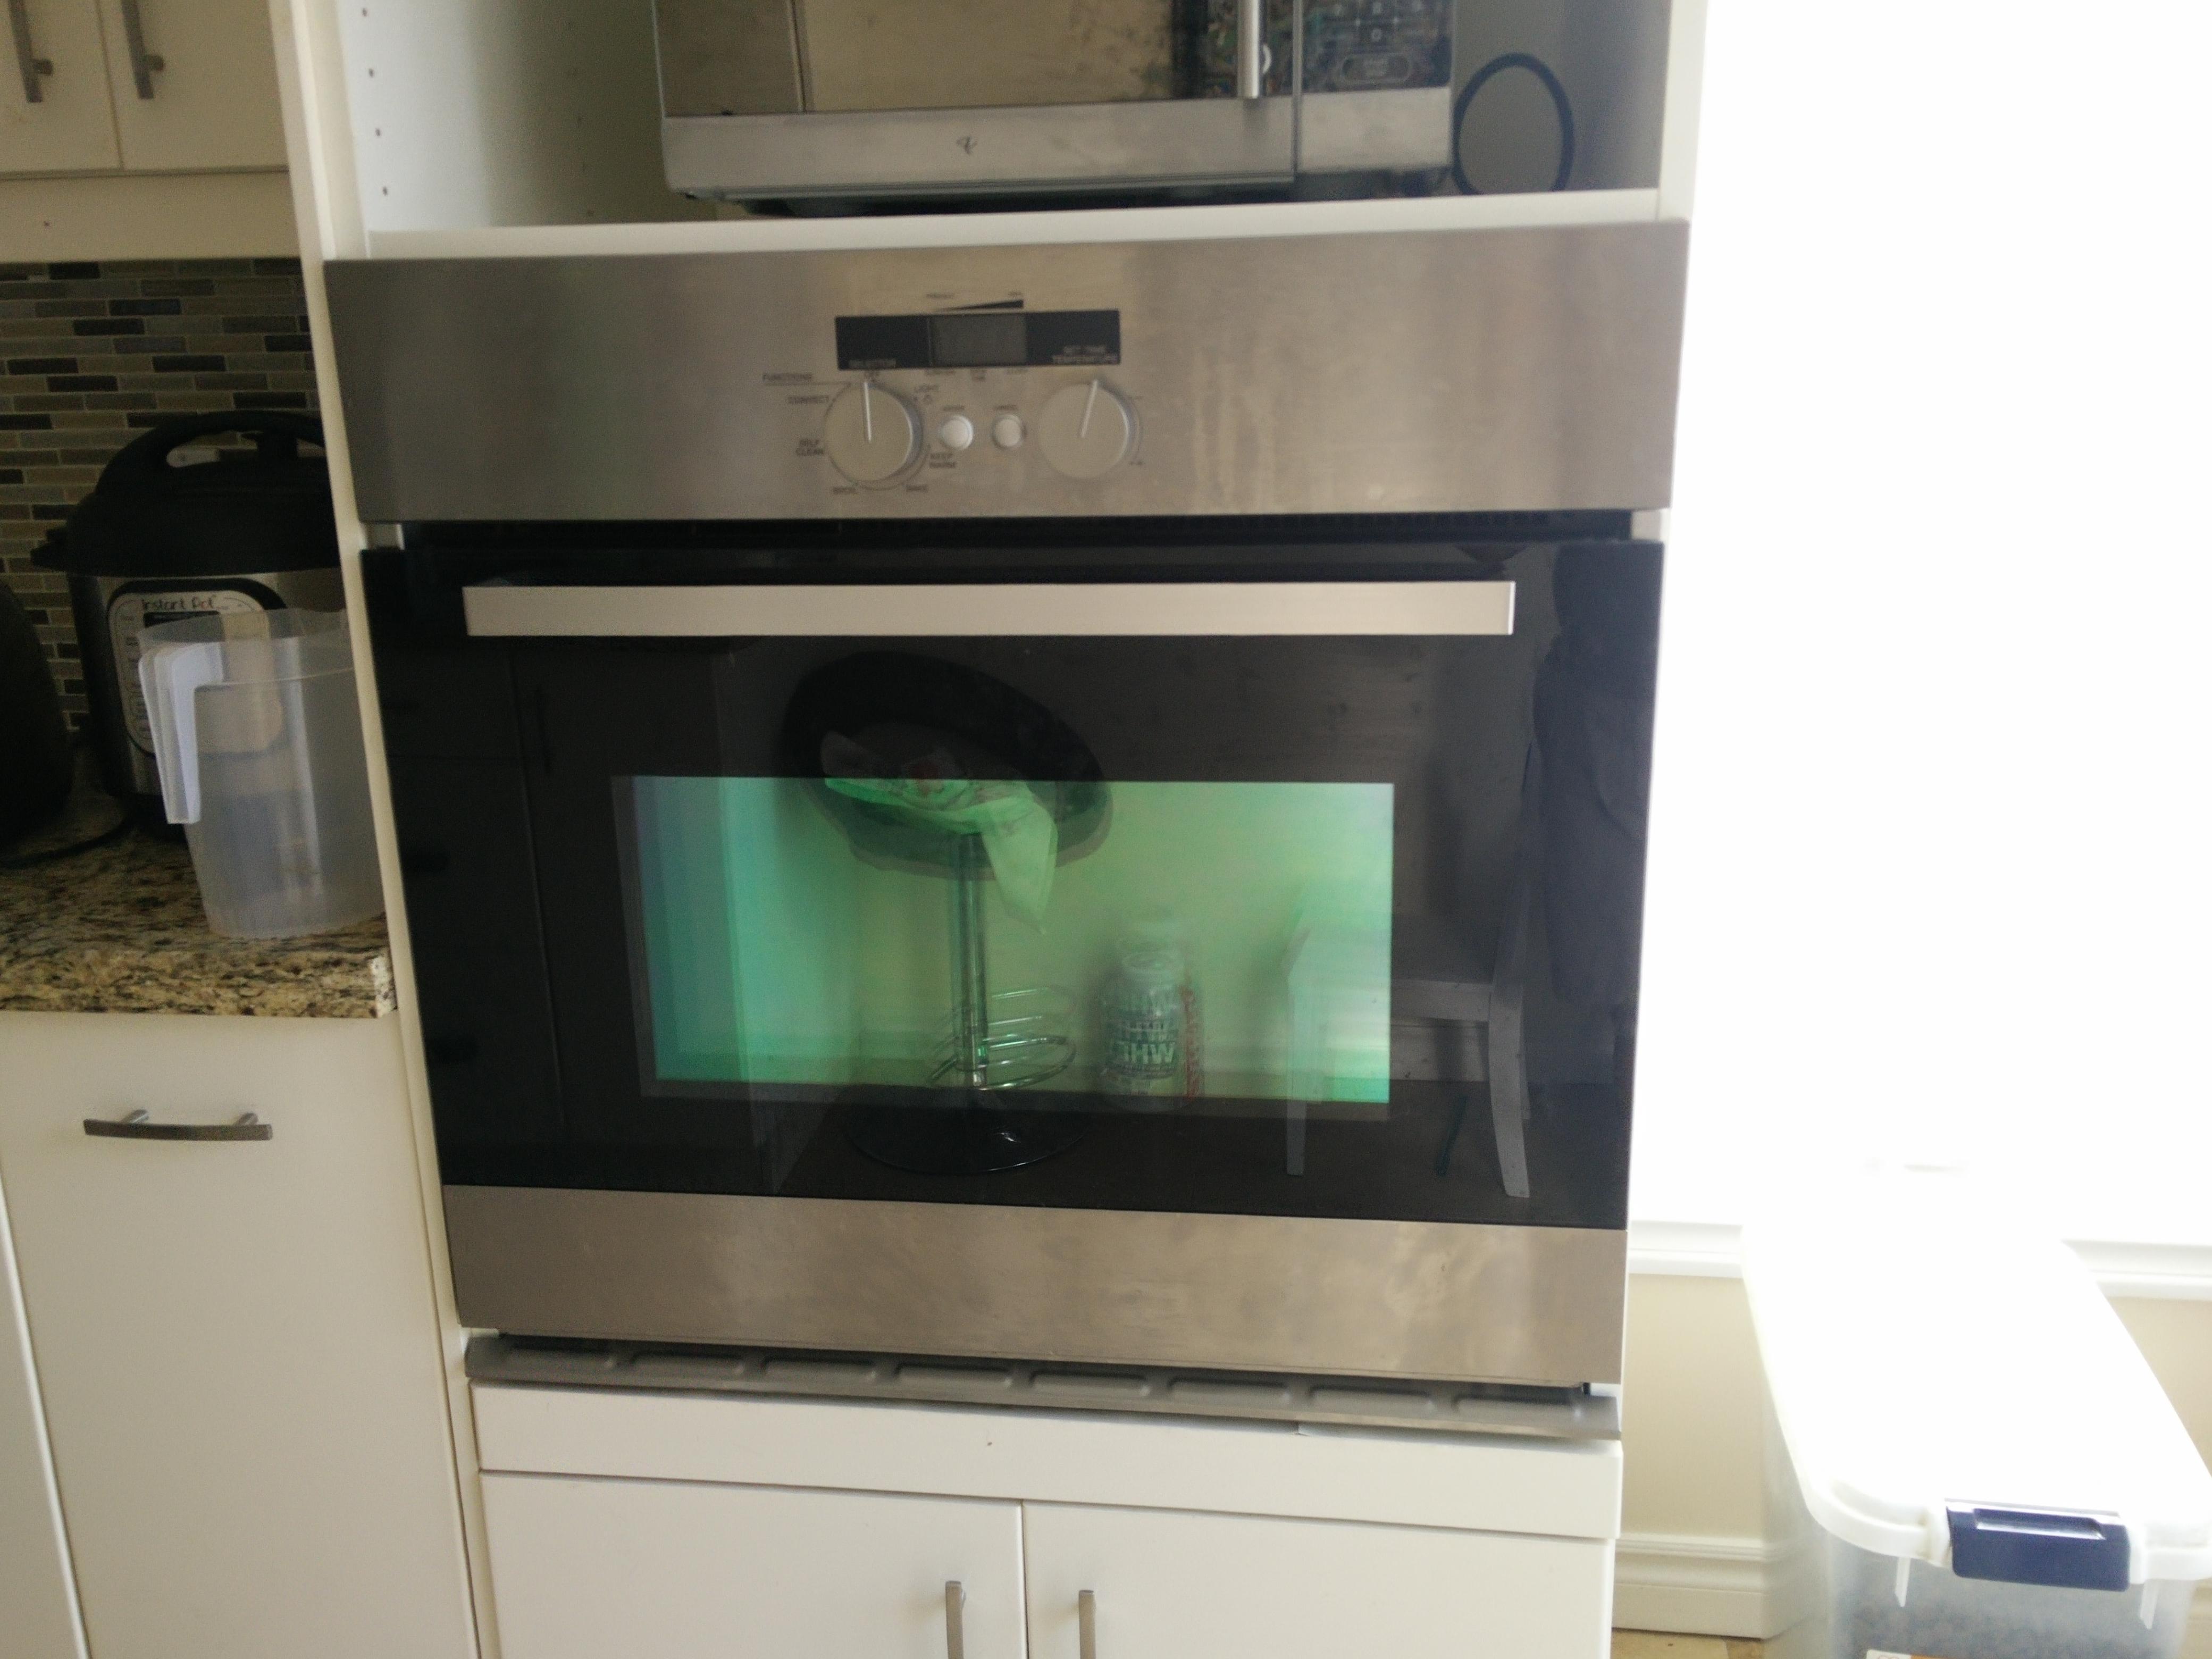 oven door locked with no power after